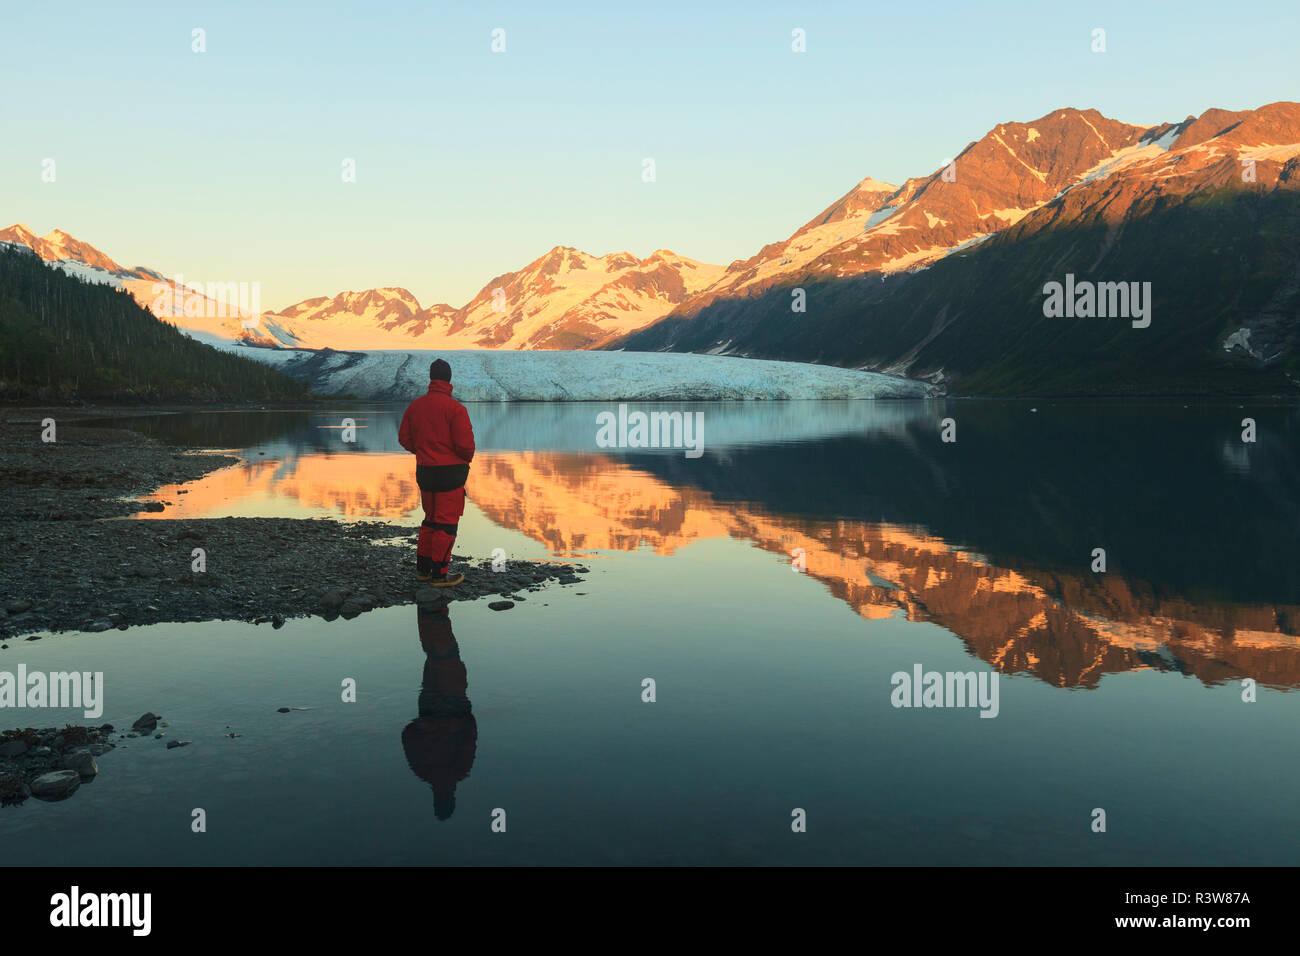 Ecotourist, Sunrise, Harriman Fiord, Chugach Mountains, Chugach National Forest, Prince William Sound, Alaska - Stock Image